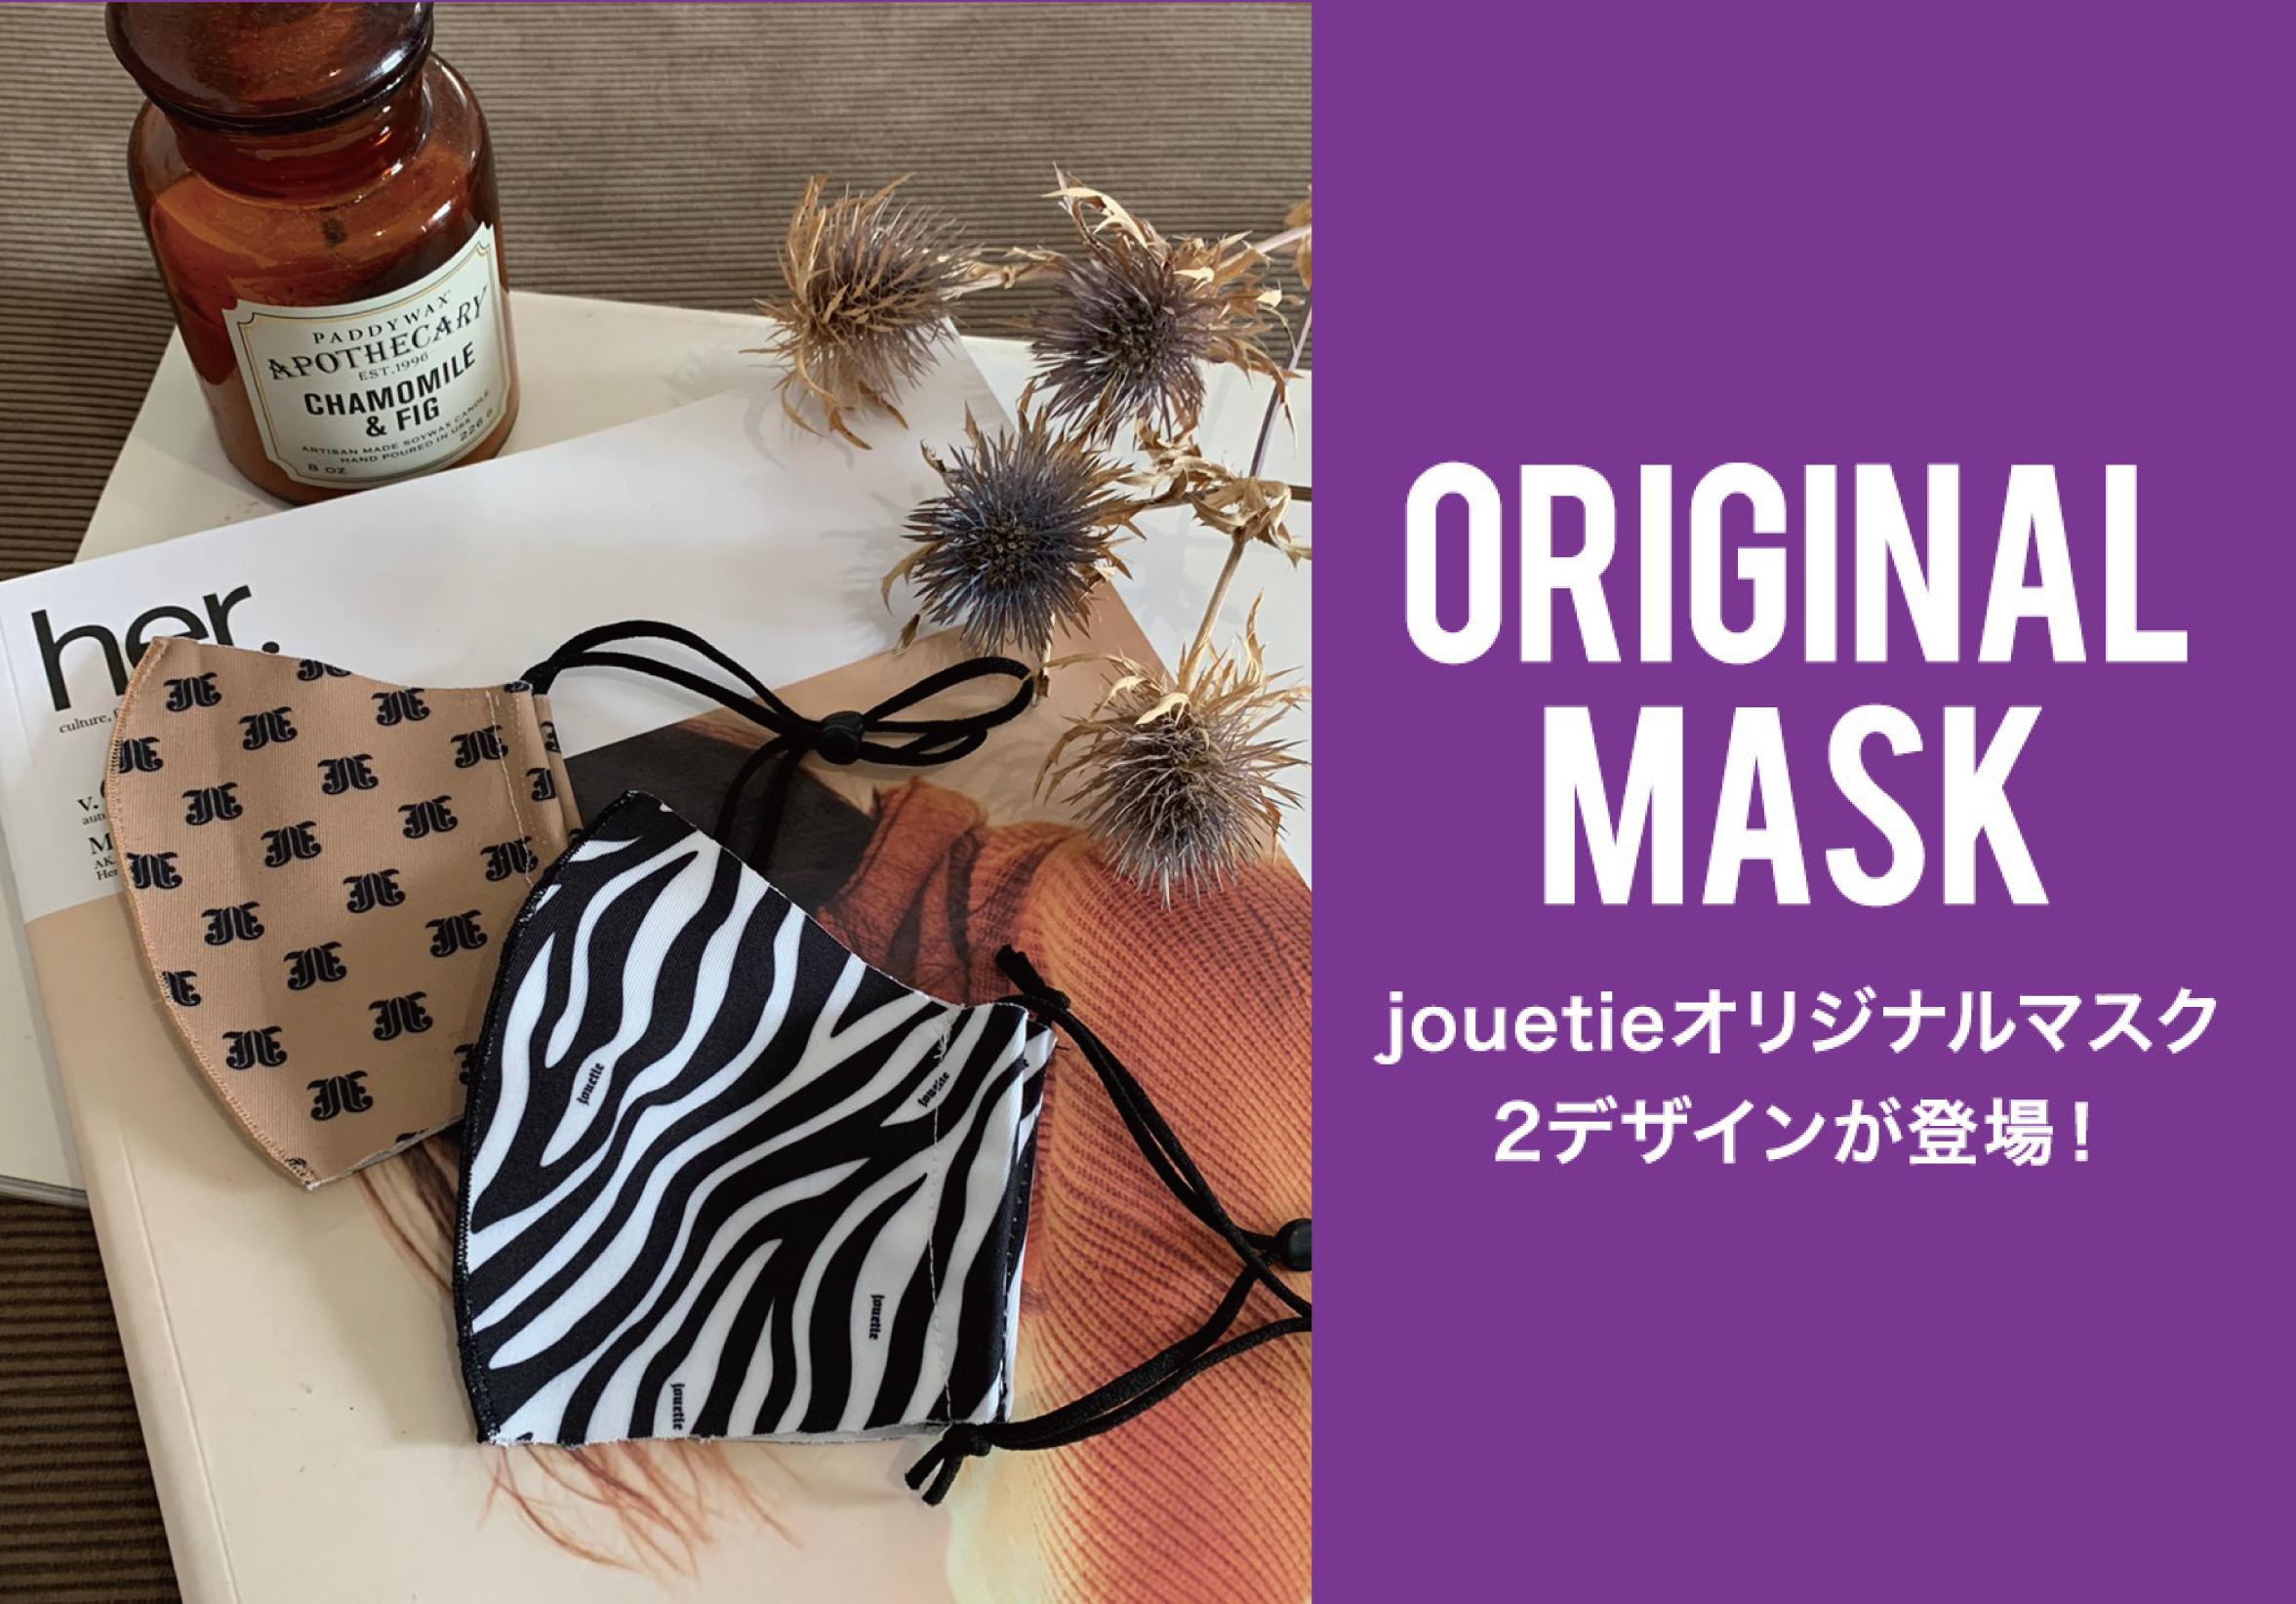 【ORIGINAL MASK】